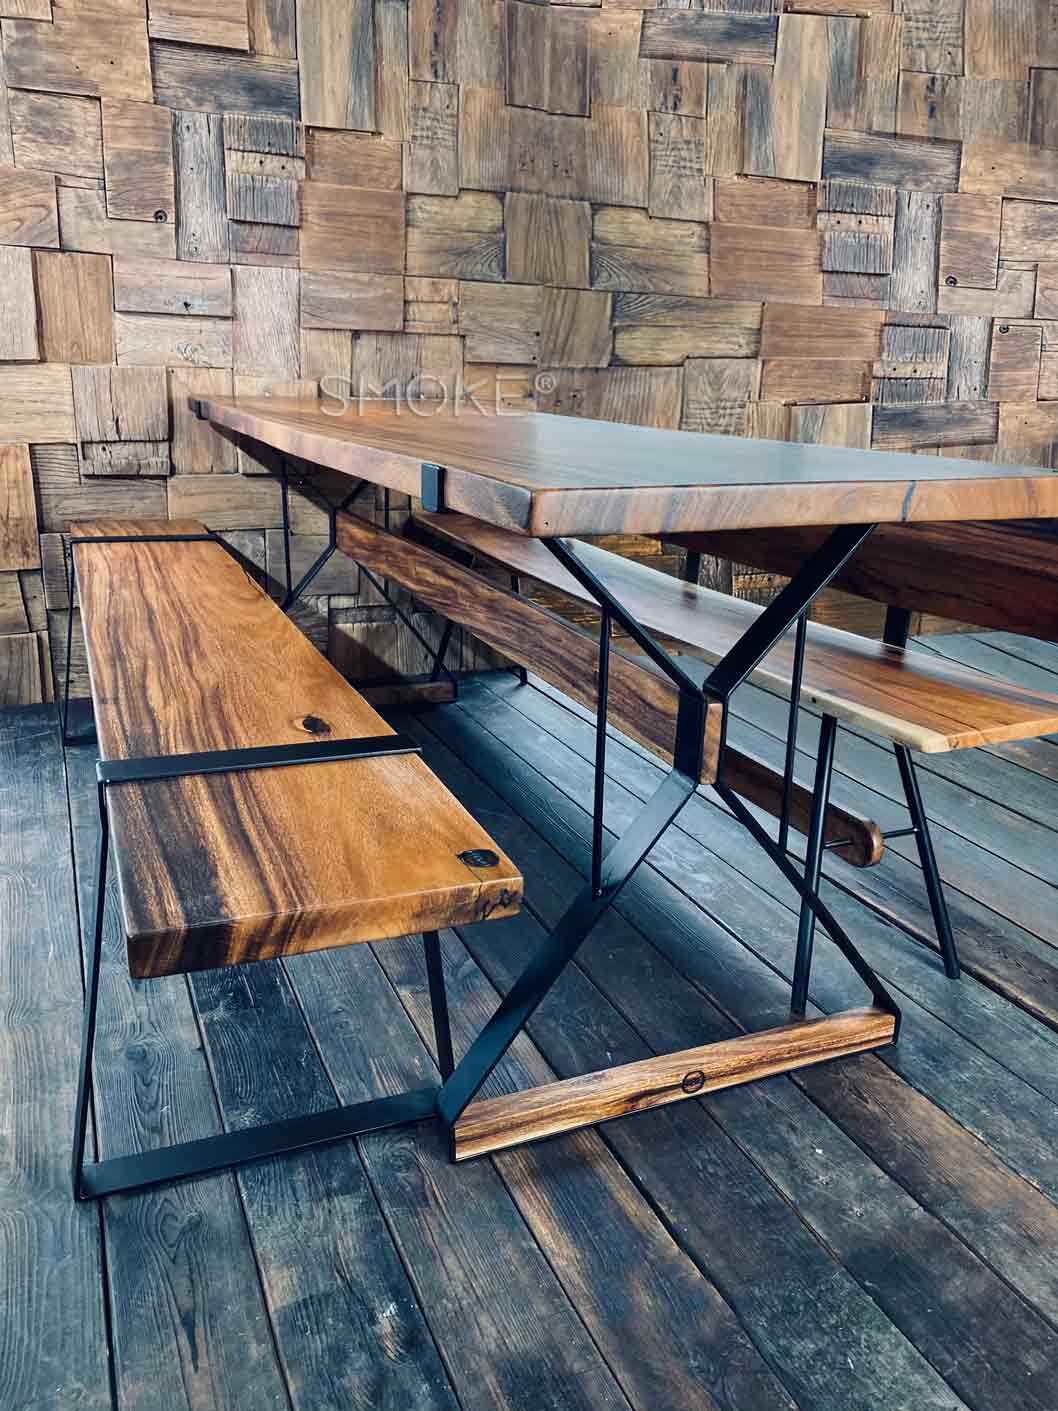 raintree wood table and bench